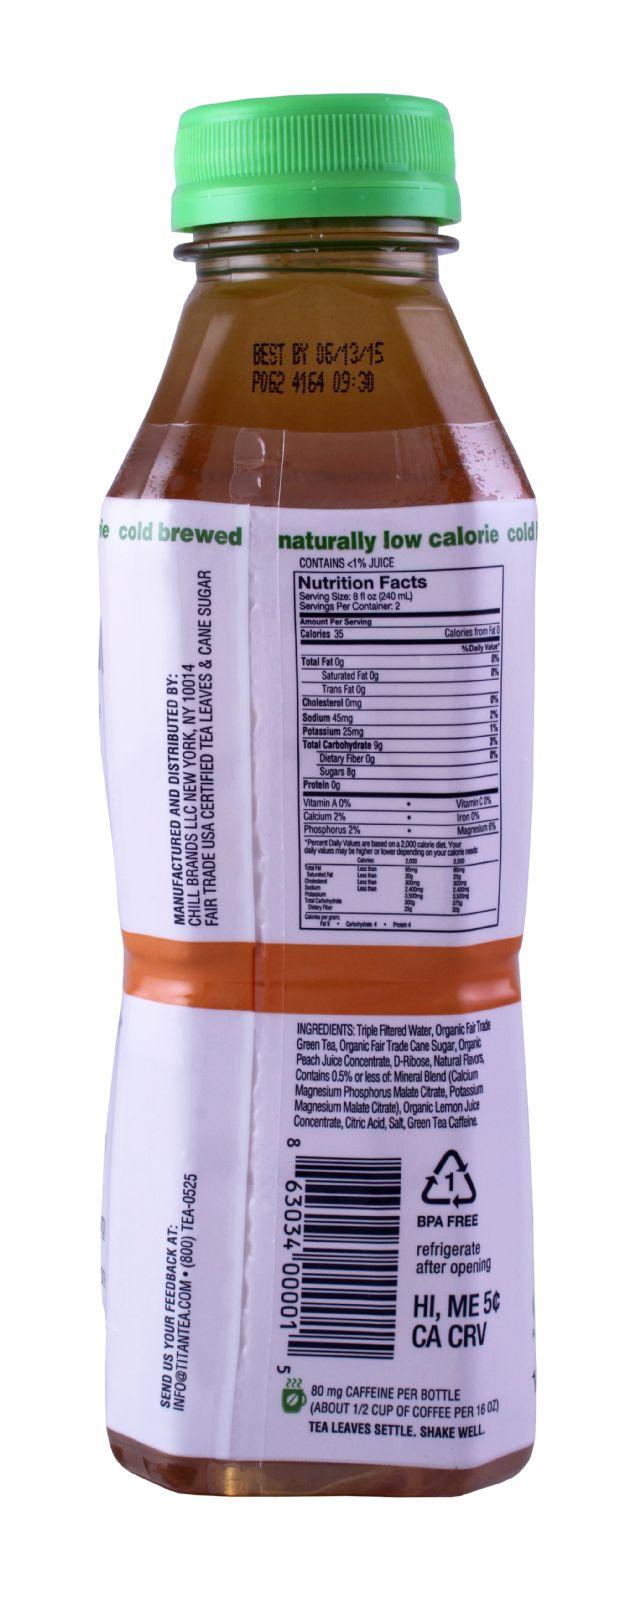 Titan Tea: TitanTea Peach Facts